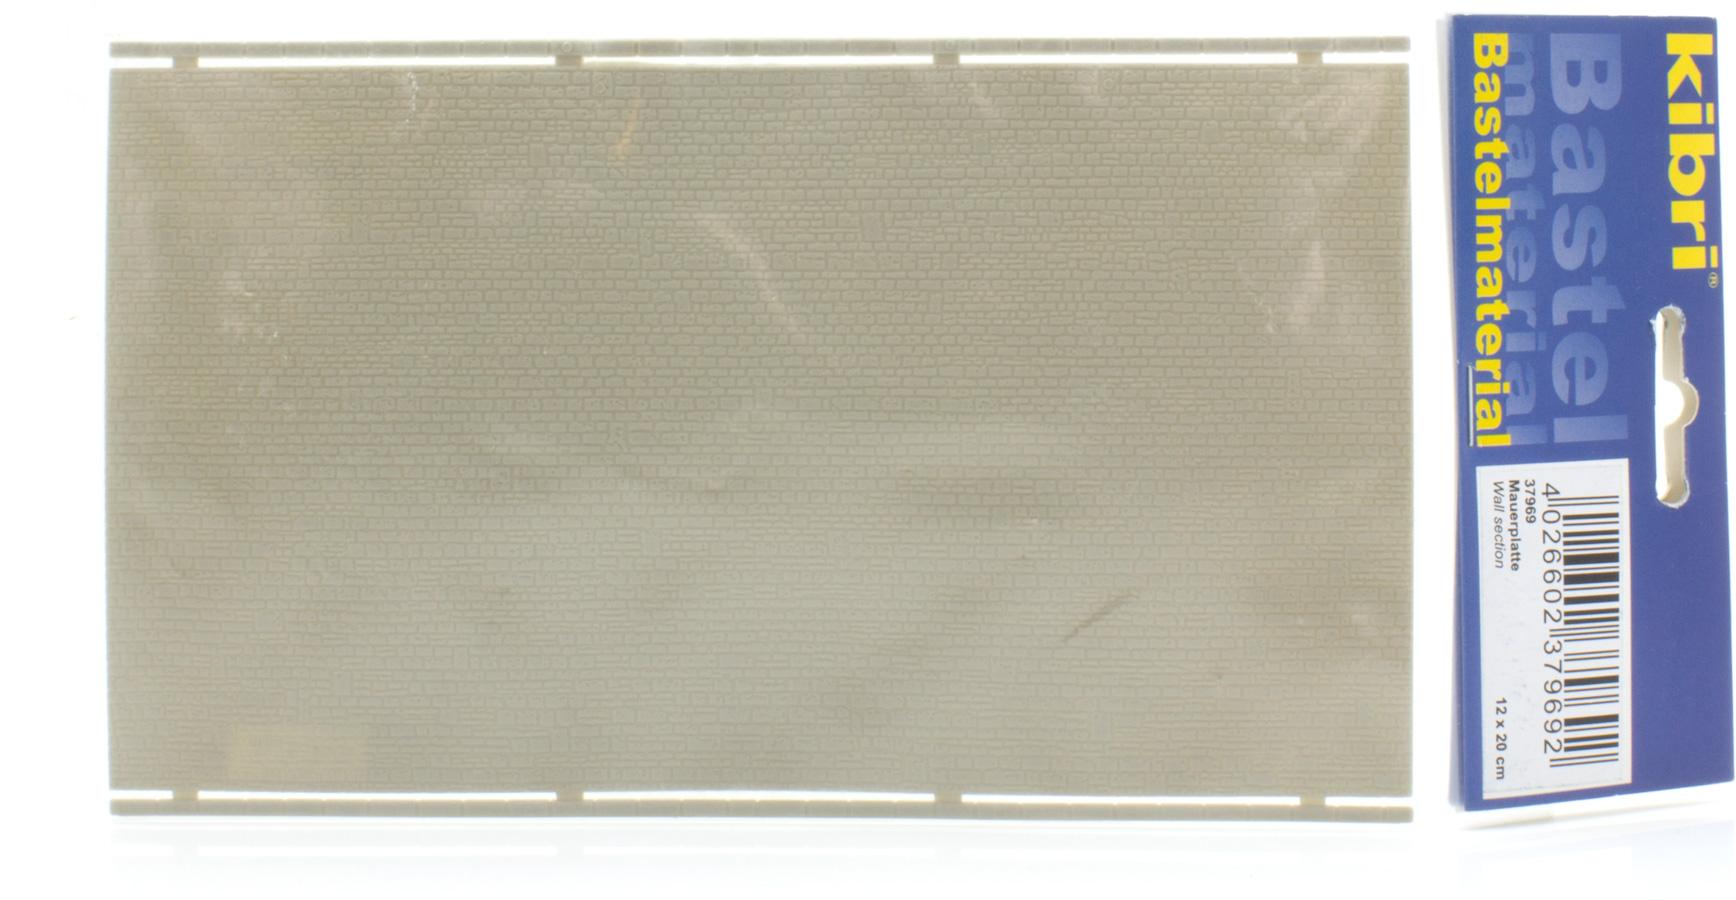 Spur N Kibri 37969 Mauerplatte unregelmäßig 20 x 12 cm